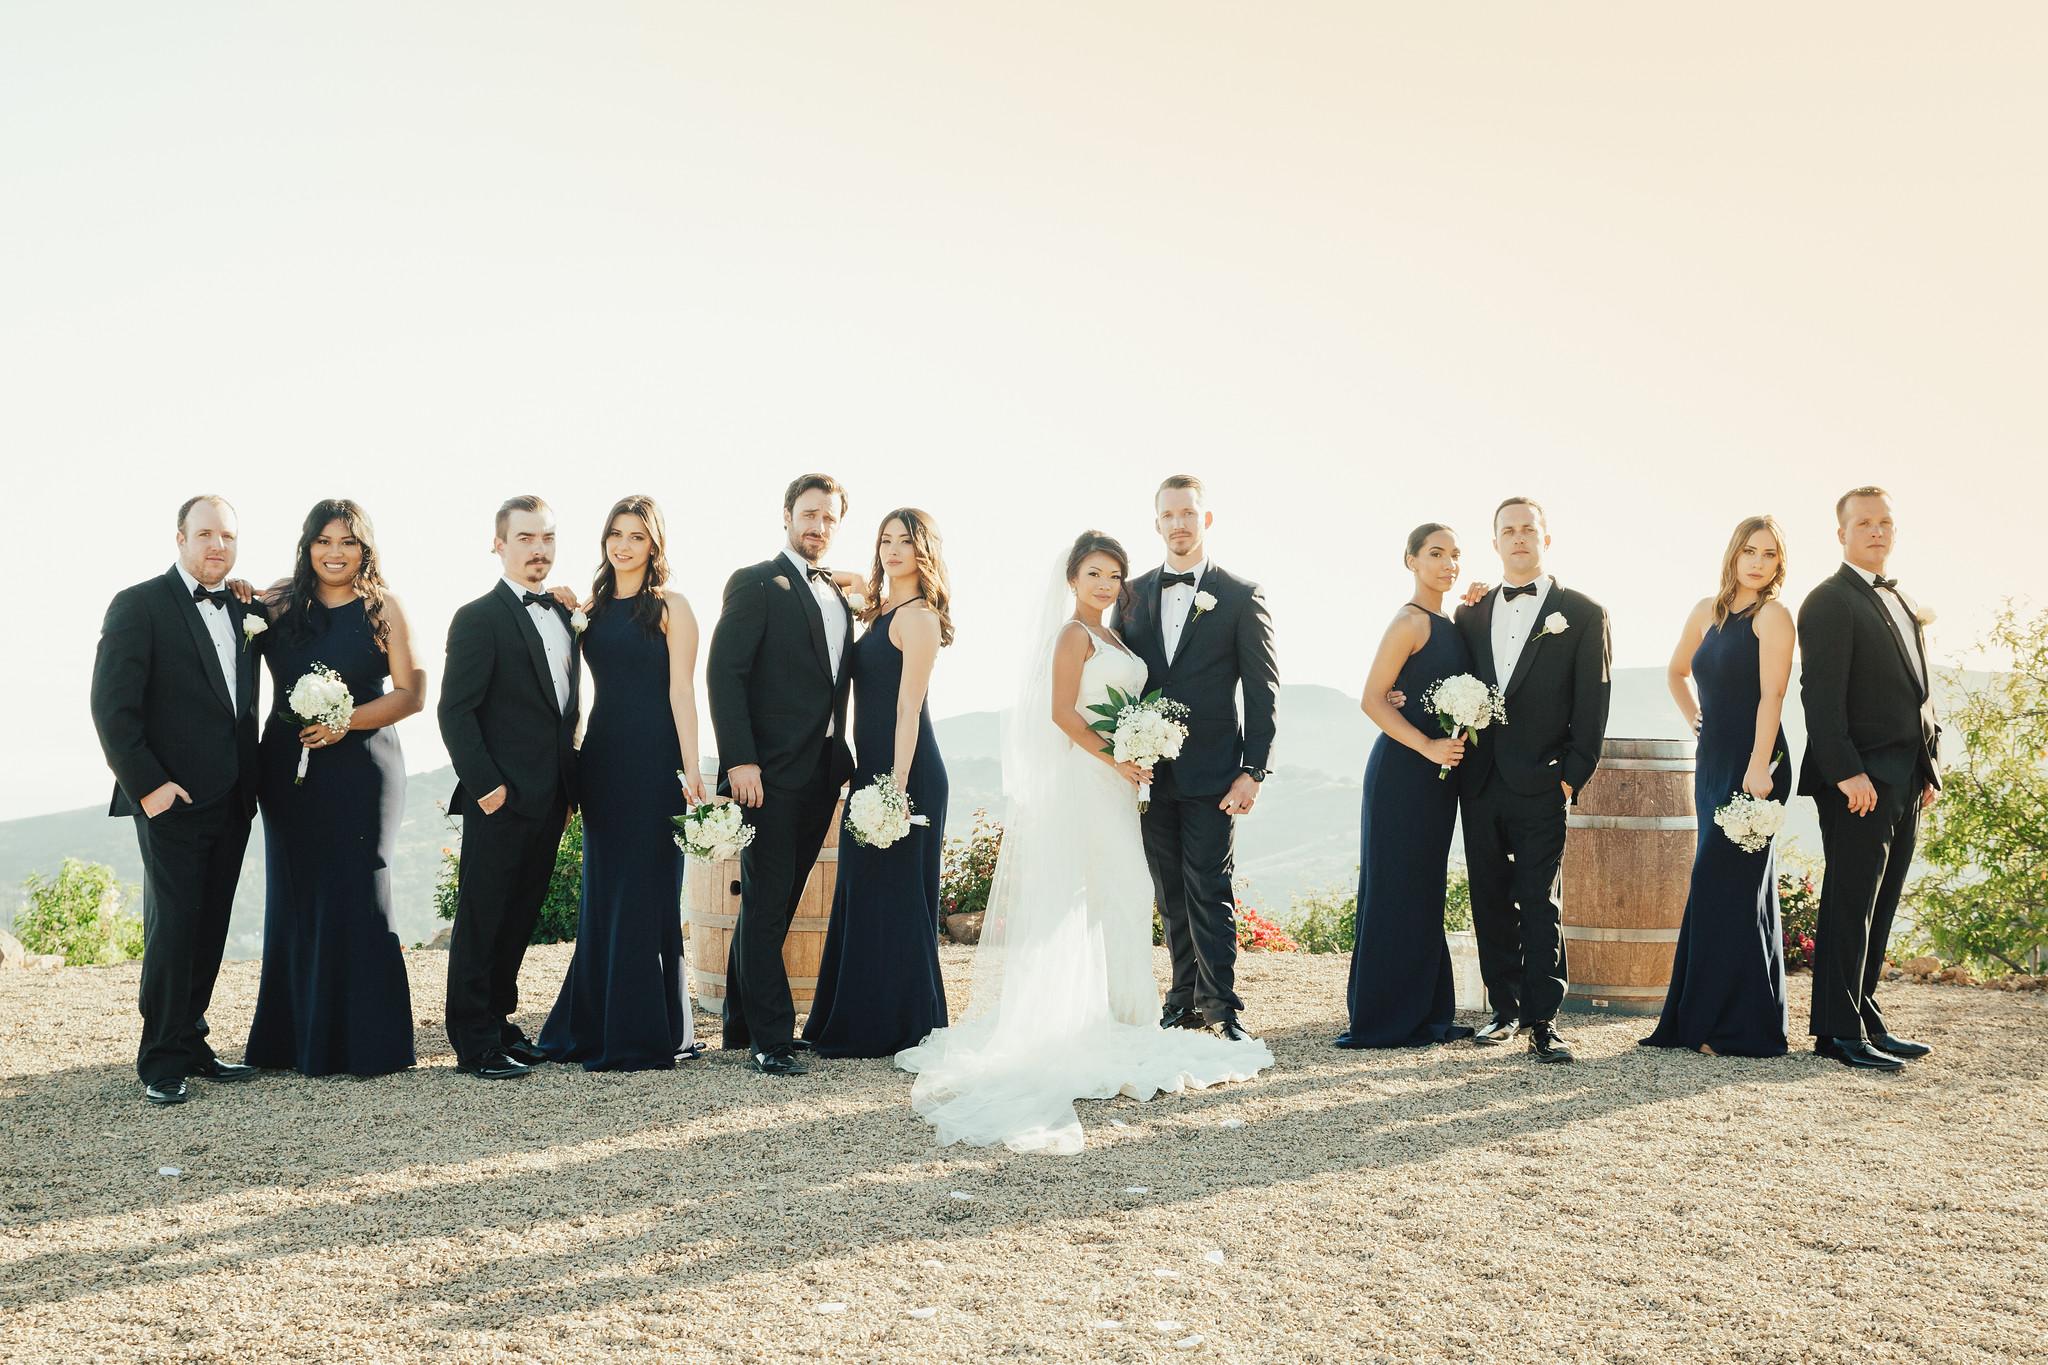 Los Angeles Wedding Photography. LifeStory.Film